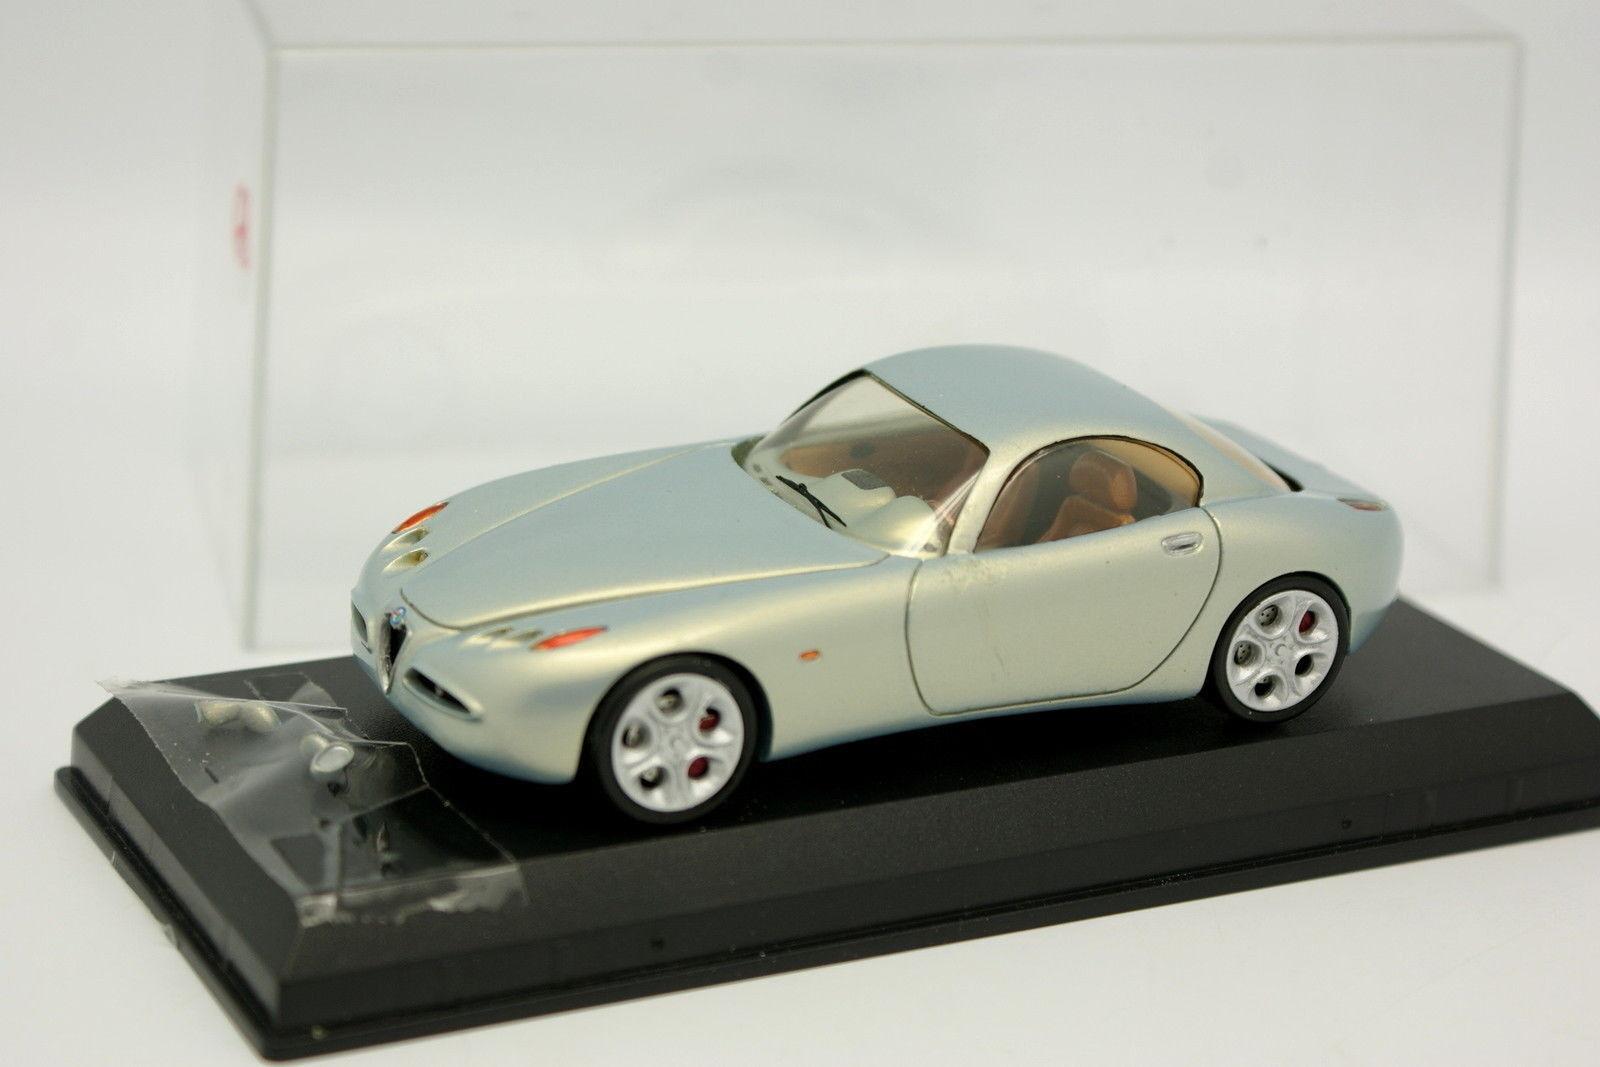 BOG Modelos Resina 1 43 - Alfa Romeo Nuvola 1999